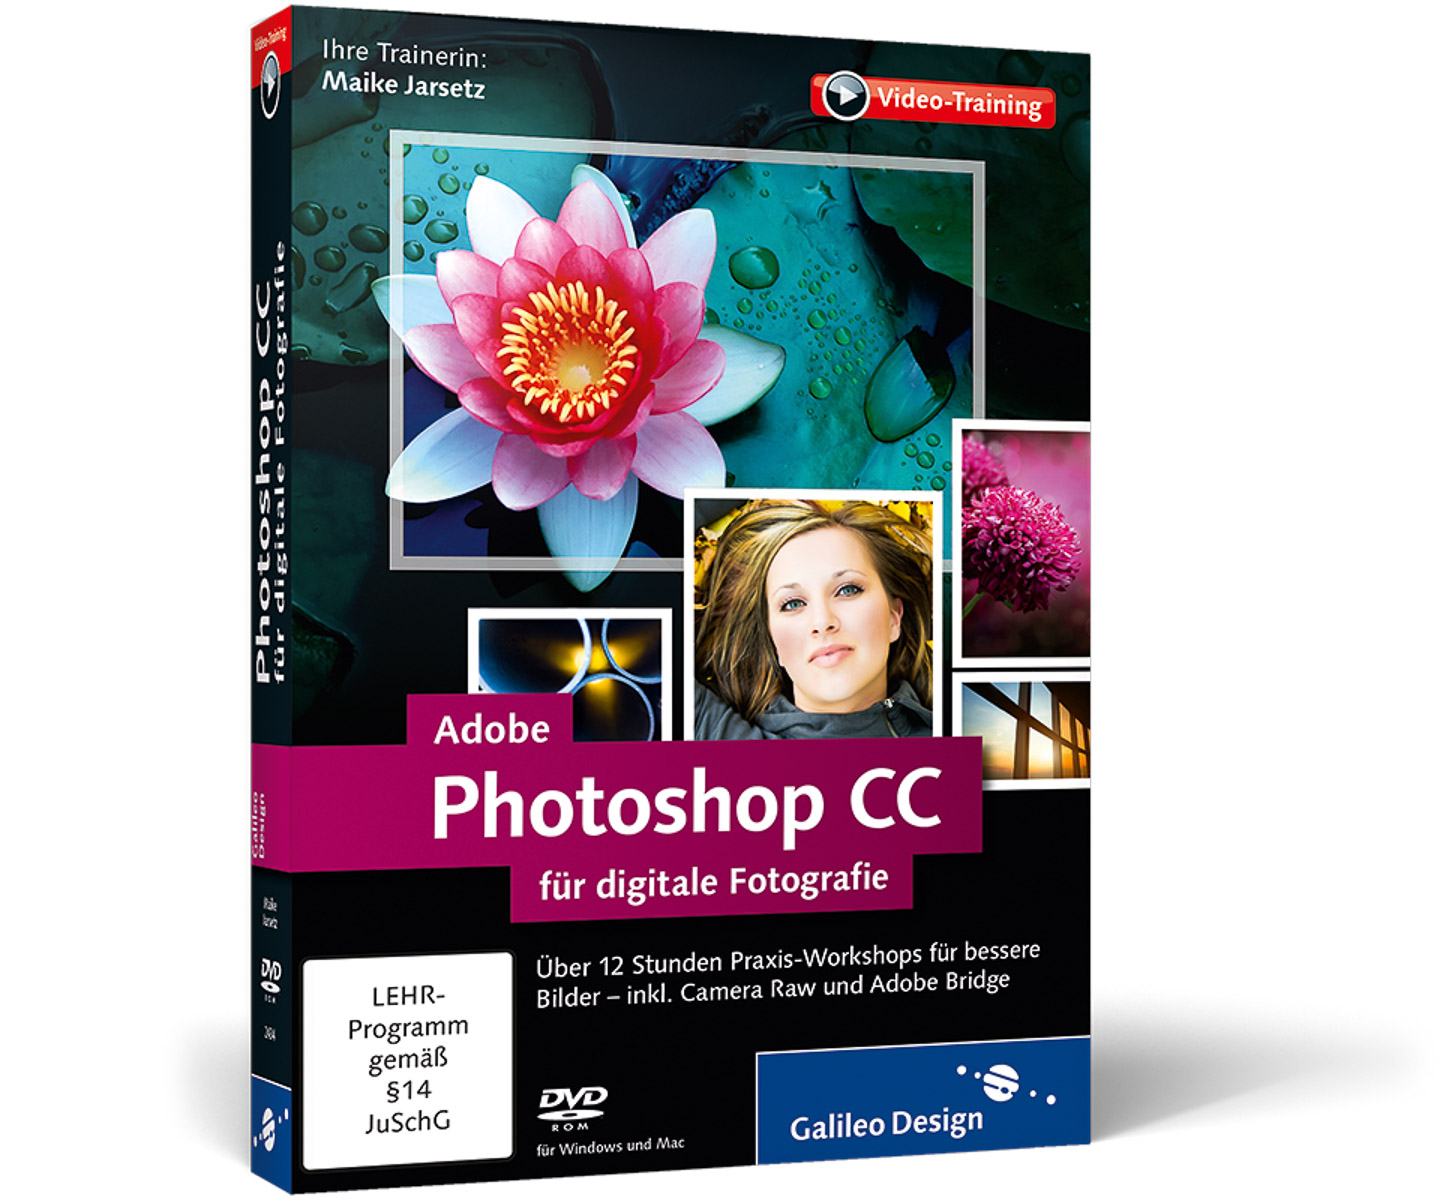 Photoshp CC